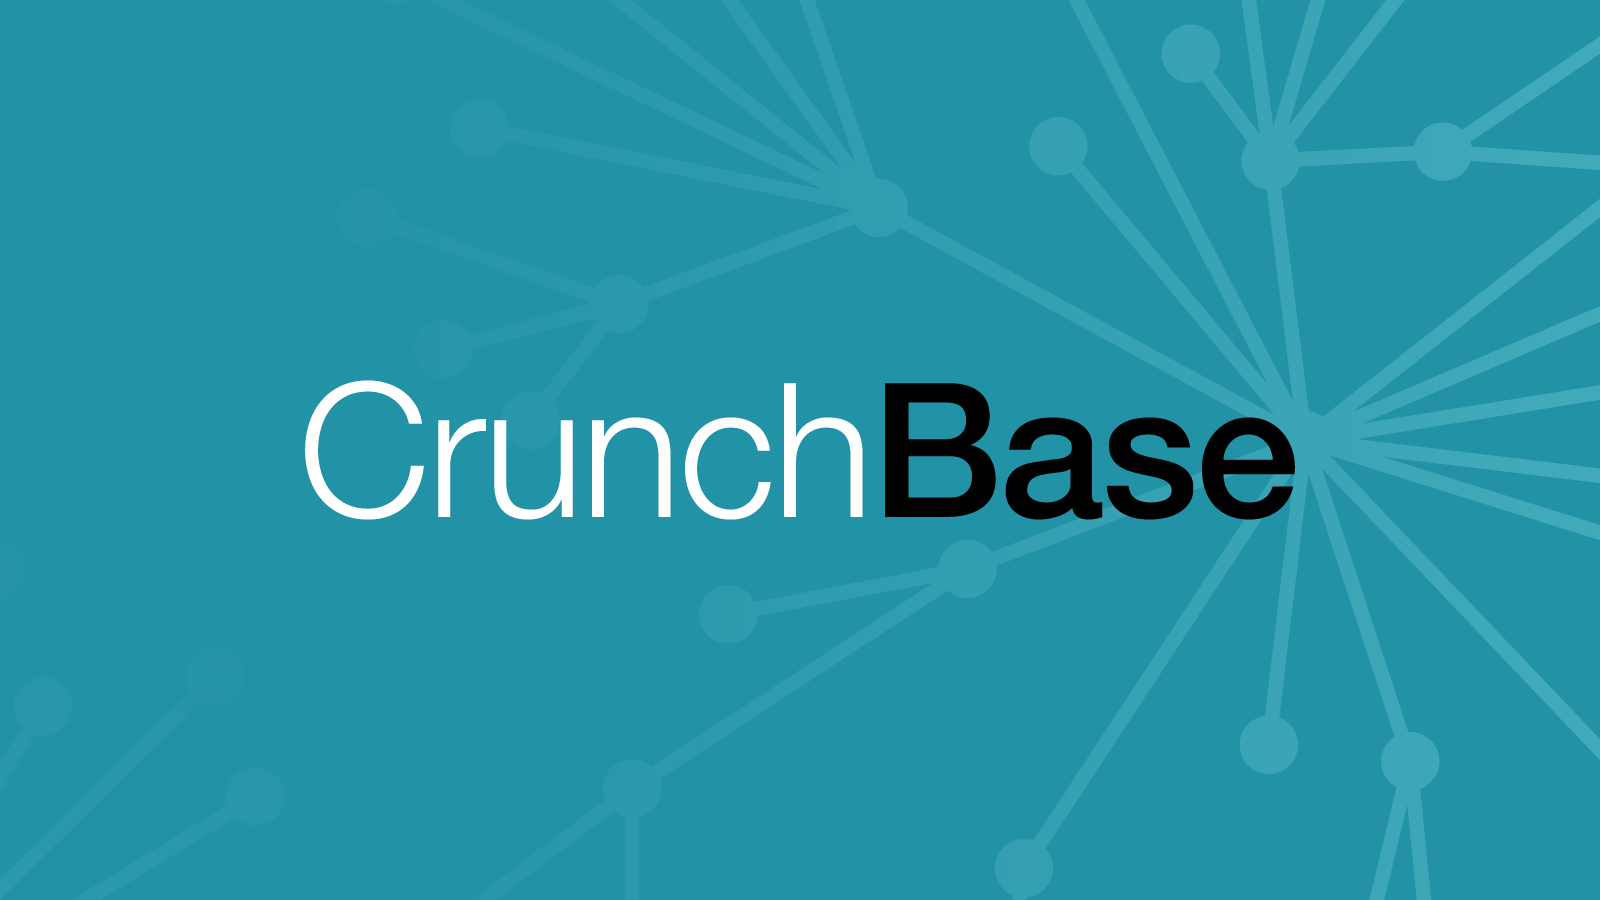 About Crunchbase | Crunchbase